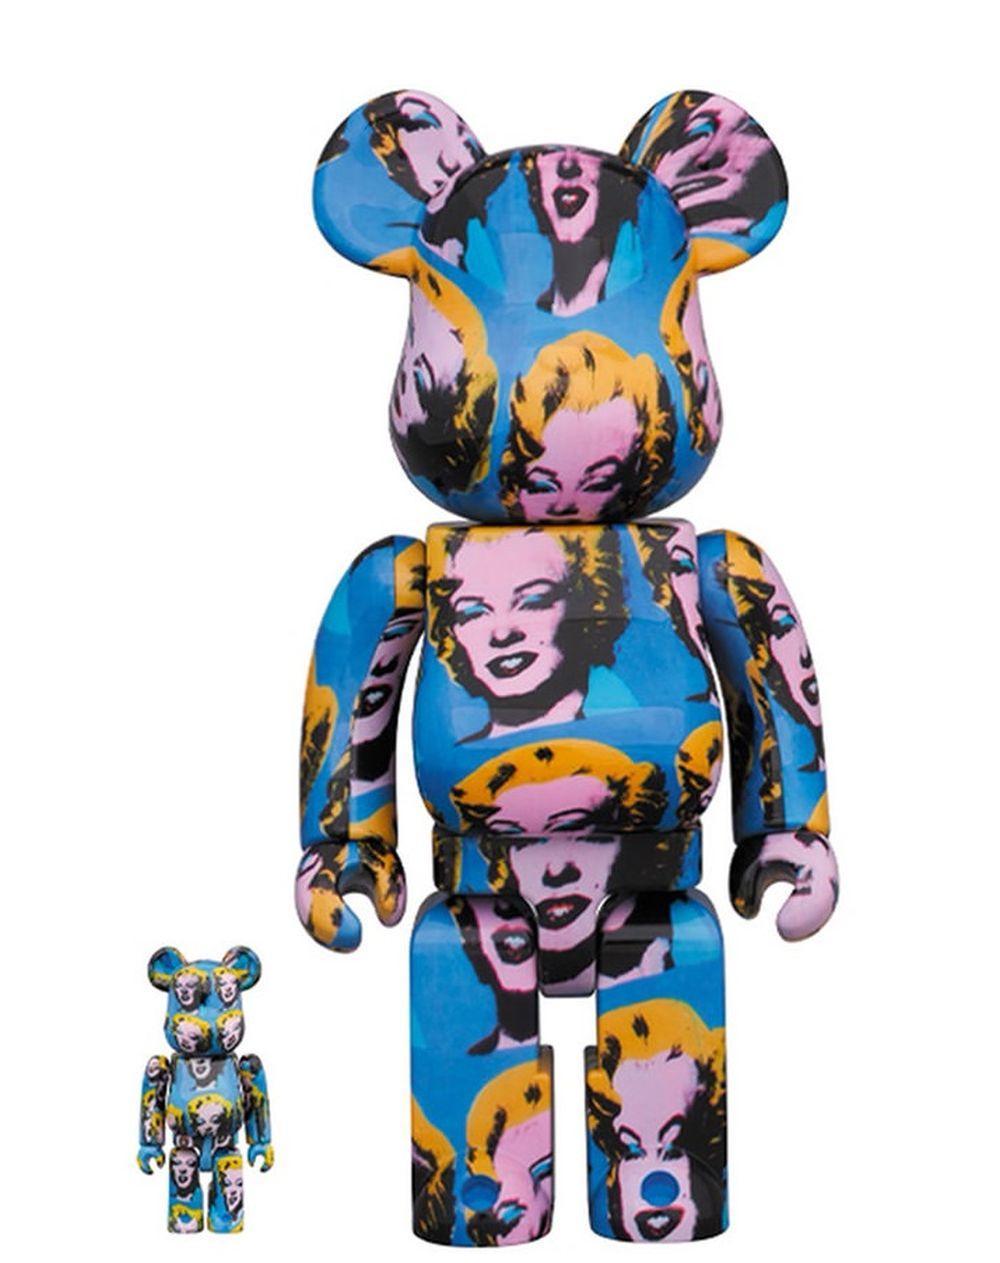 BE@RBRICK - Bearbrick Andy Warhol's Marilyn Monroe 400% + 100%